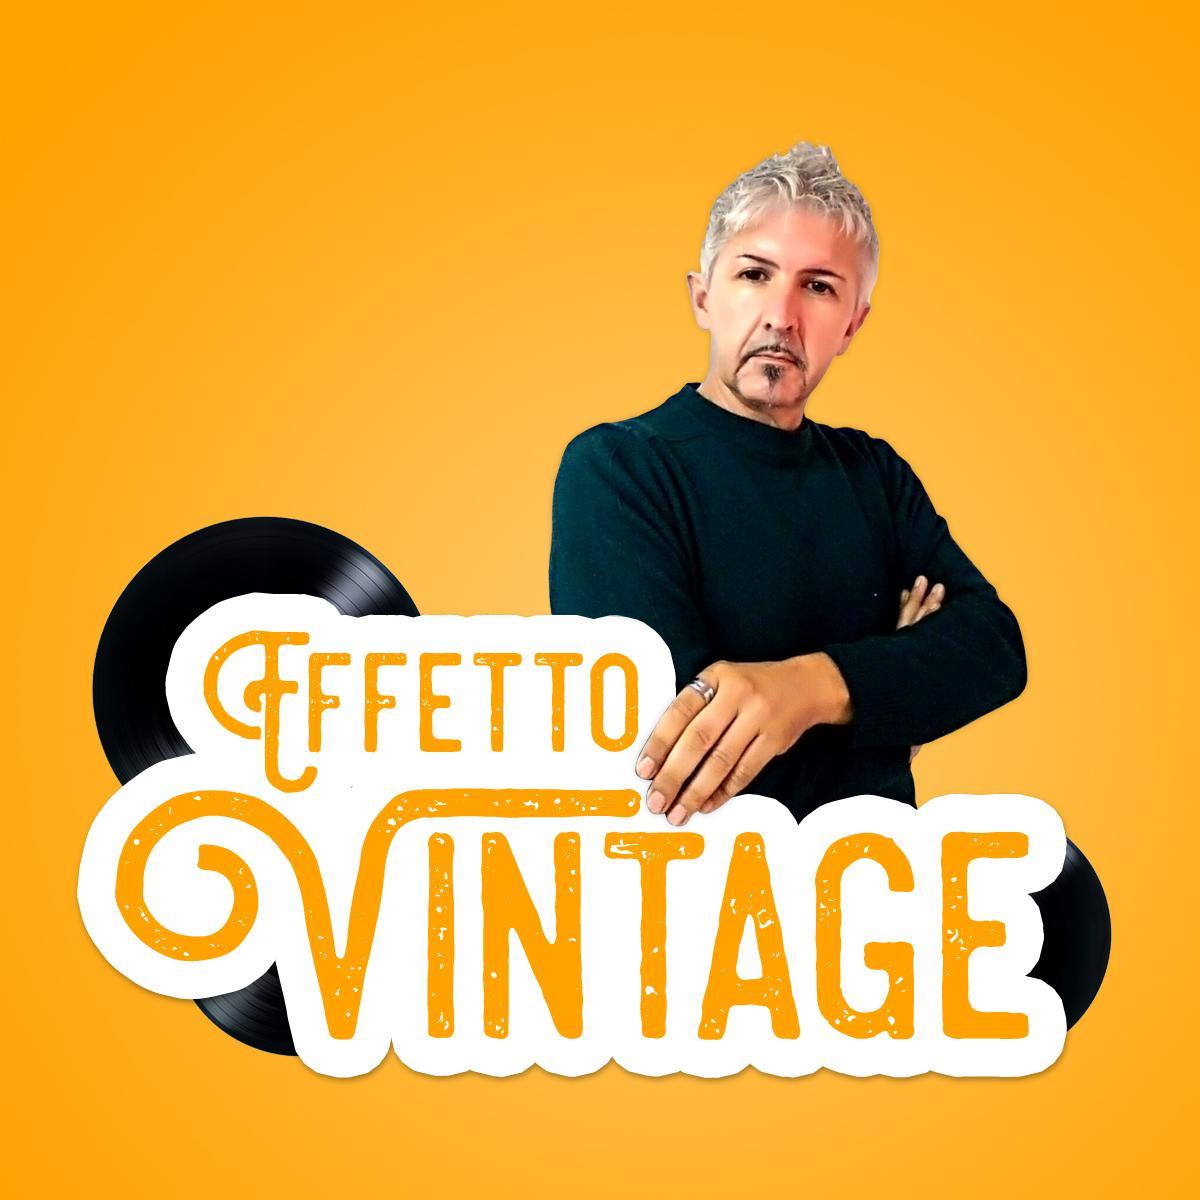 Effetto Vintage